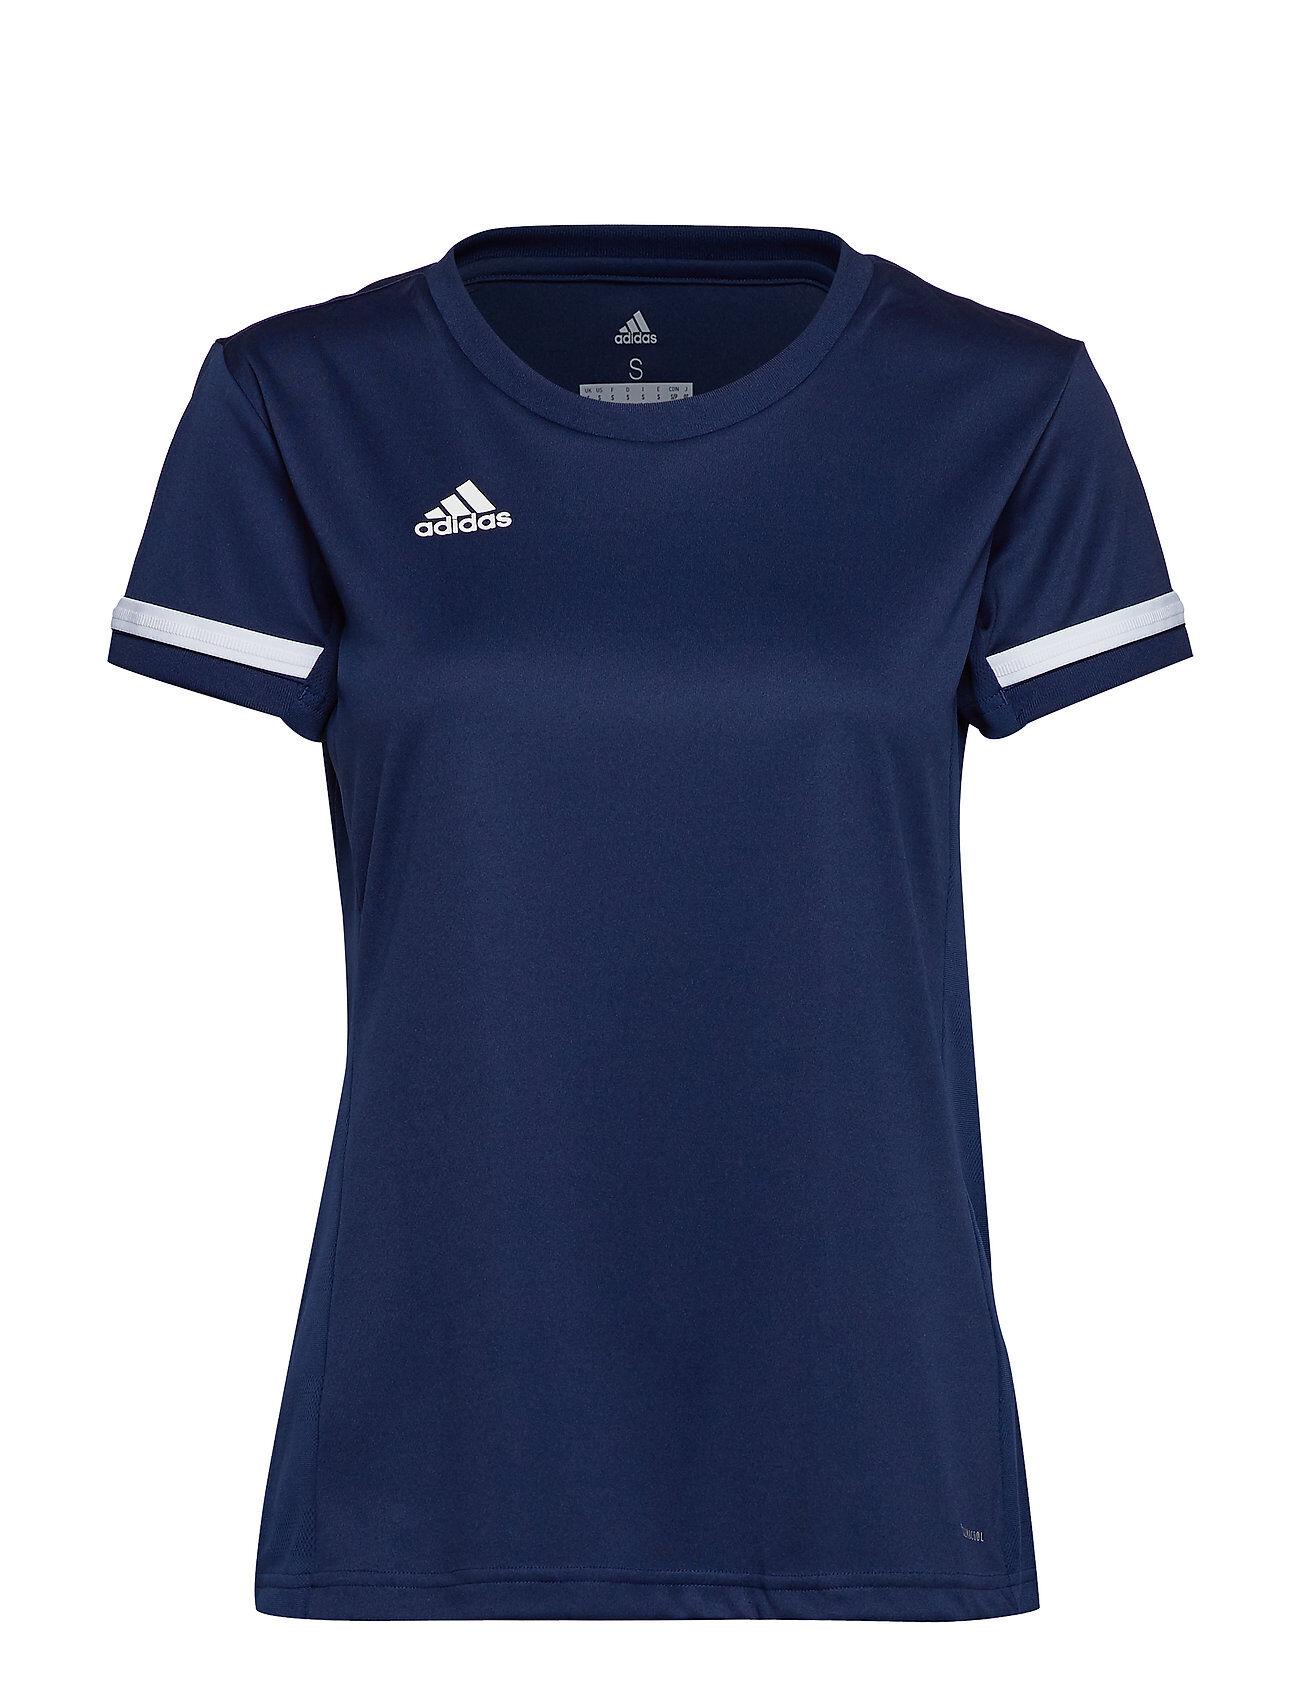 Image of adidas Performance T19 Ss Jsy W T-shirts & Tops Short-sleeved Sininen Adidas Performance